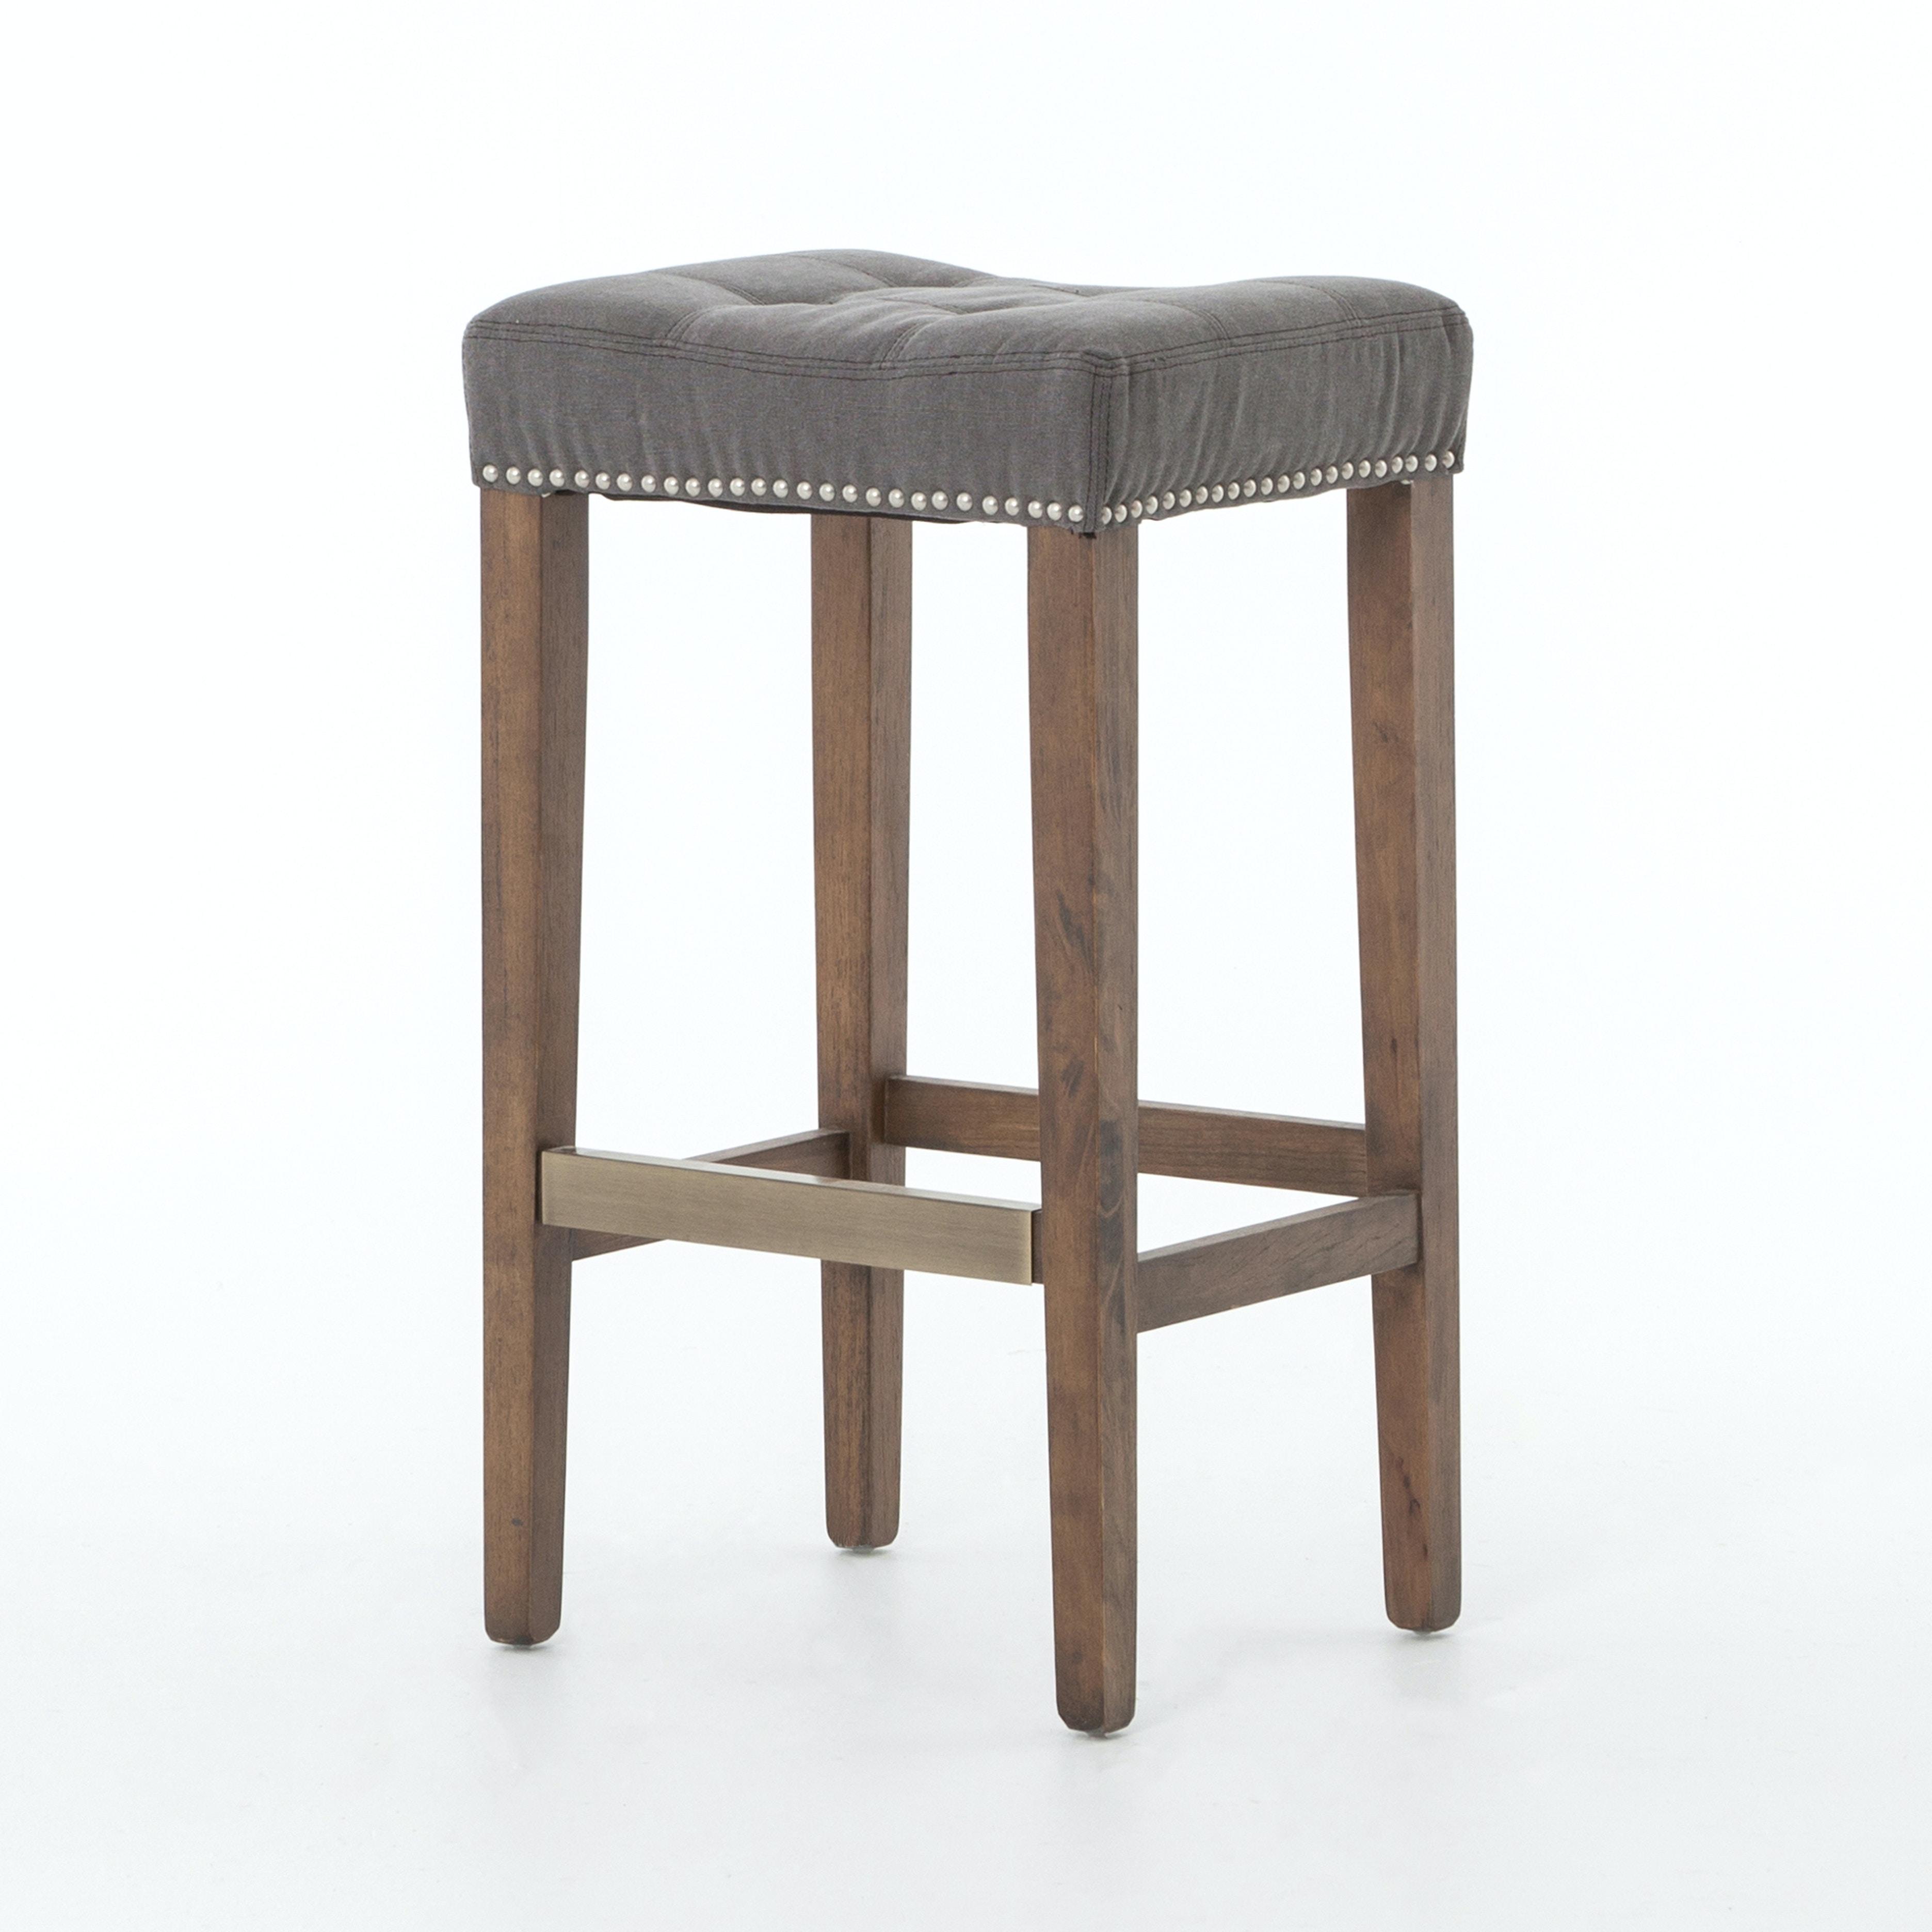 Four Hands Furniture Sean Bar Stool With Kickplate Dark Moon Can CASH 02GP